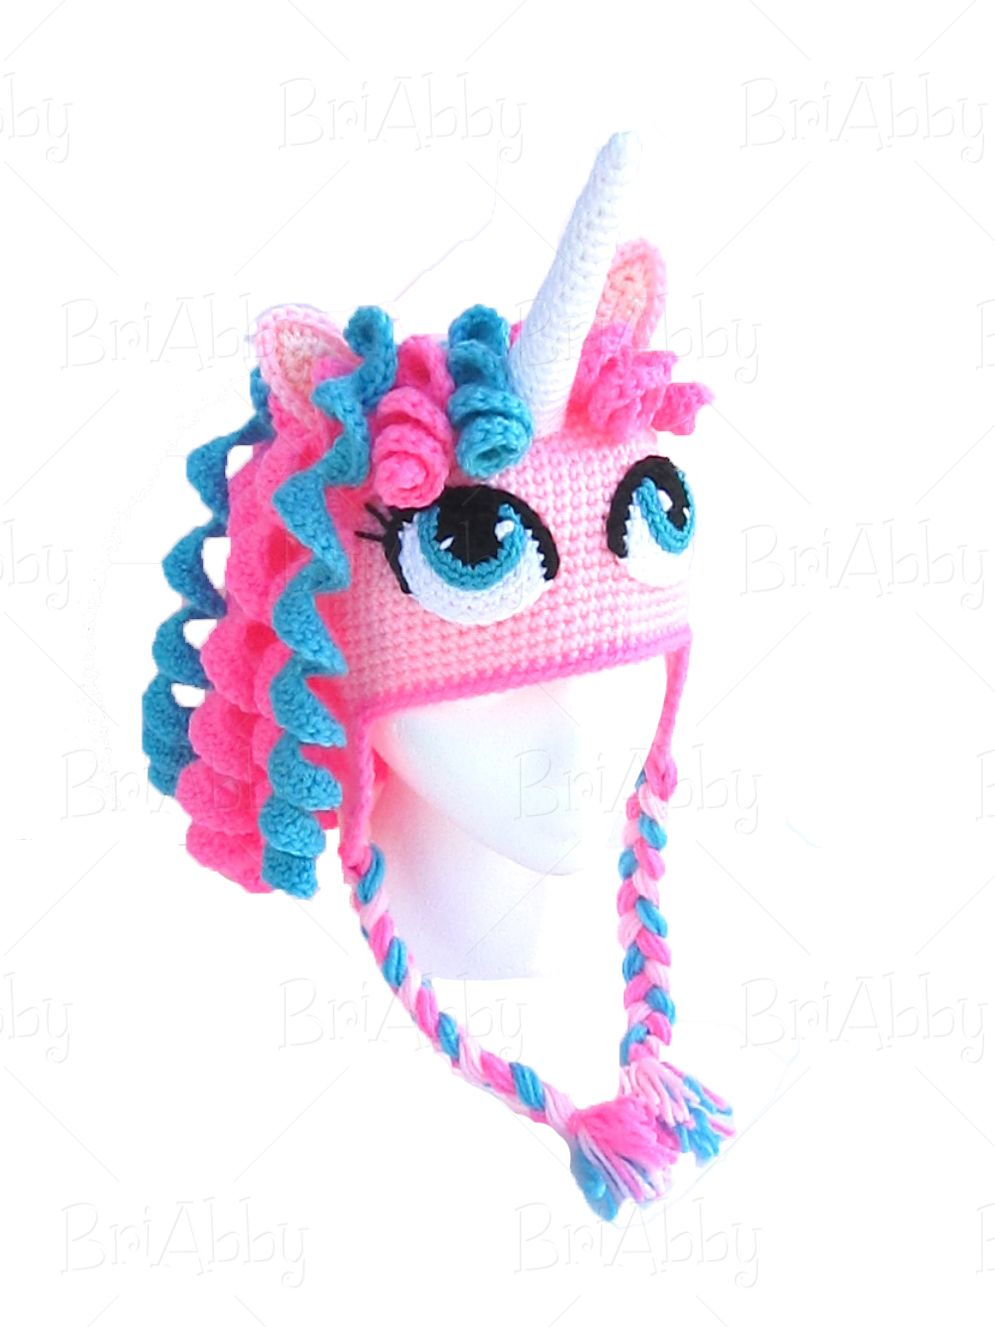 unicorn hat costume | crochet | Crochet, Crochet unicorn, Crochet ...